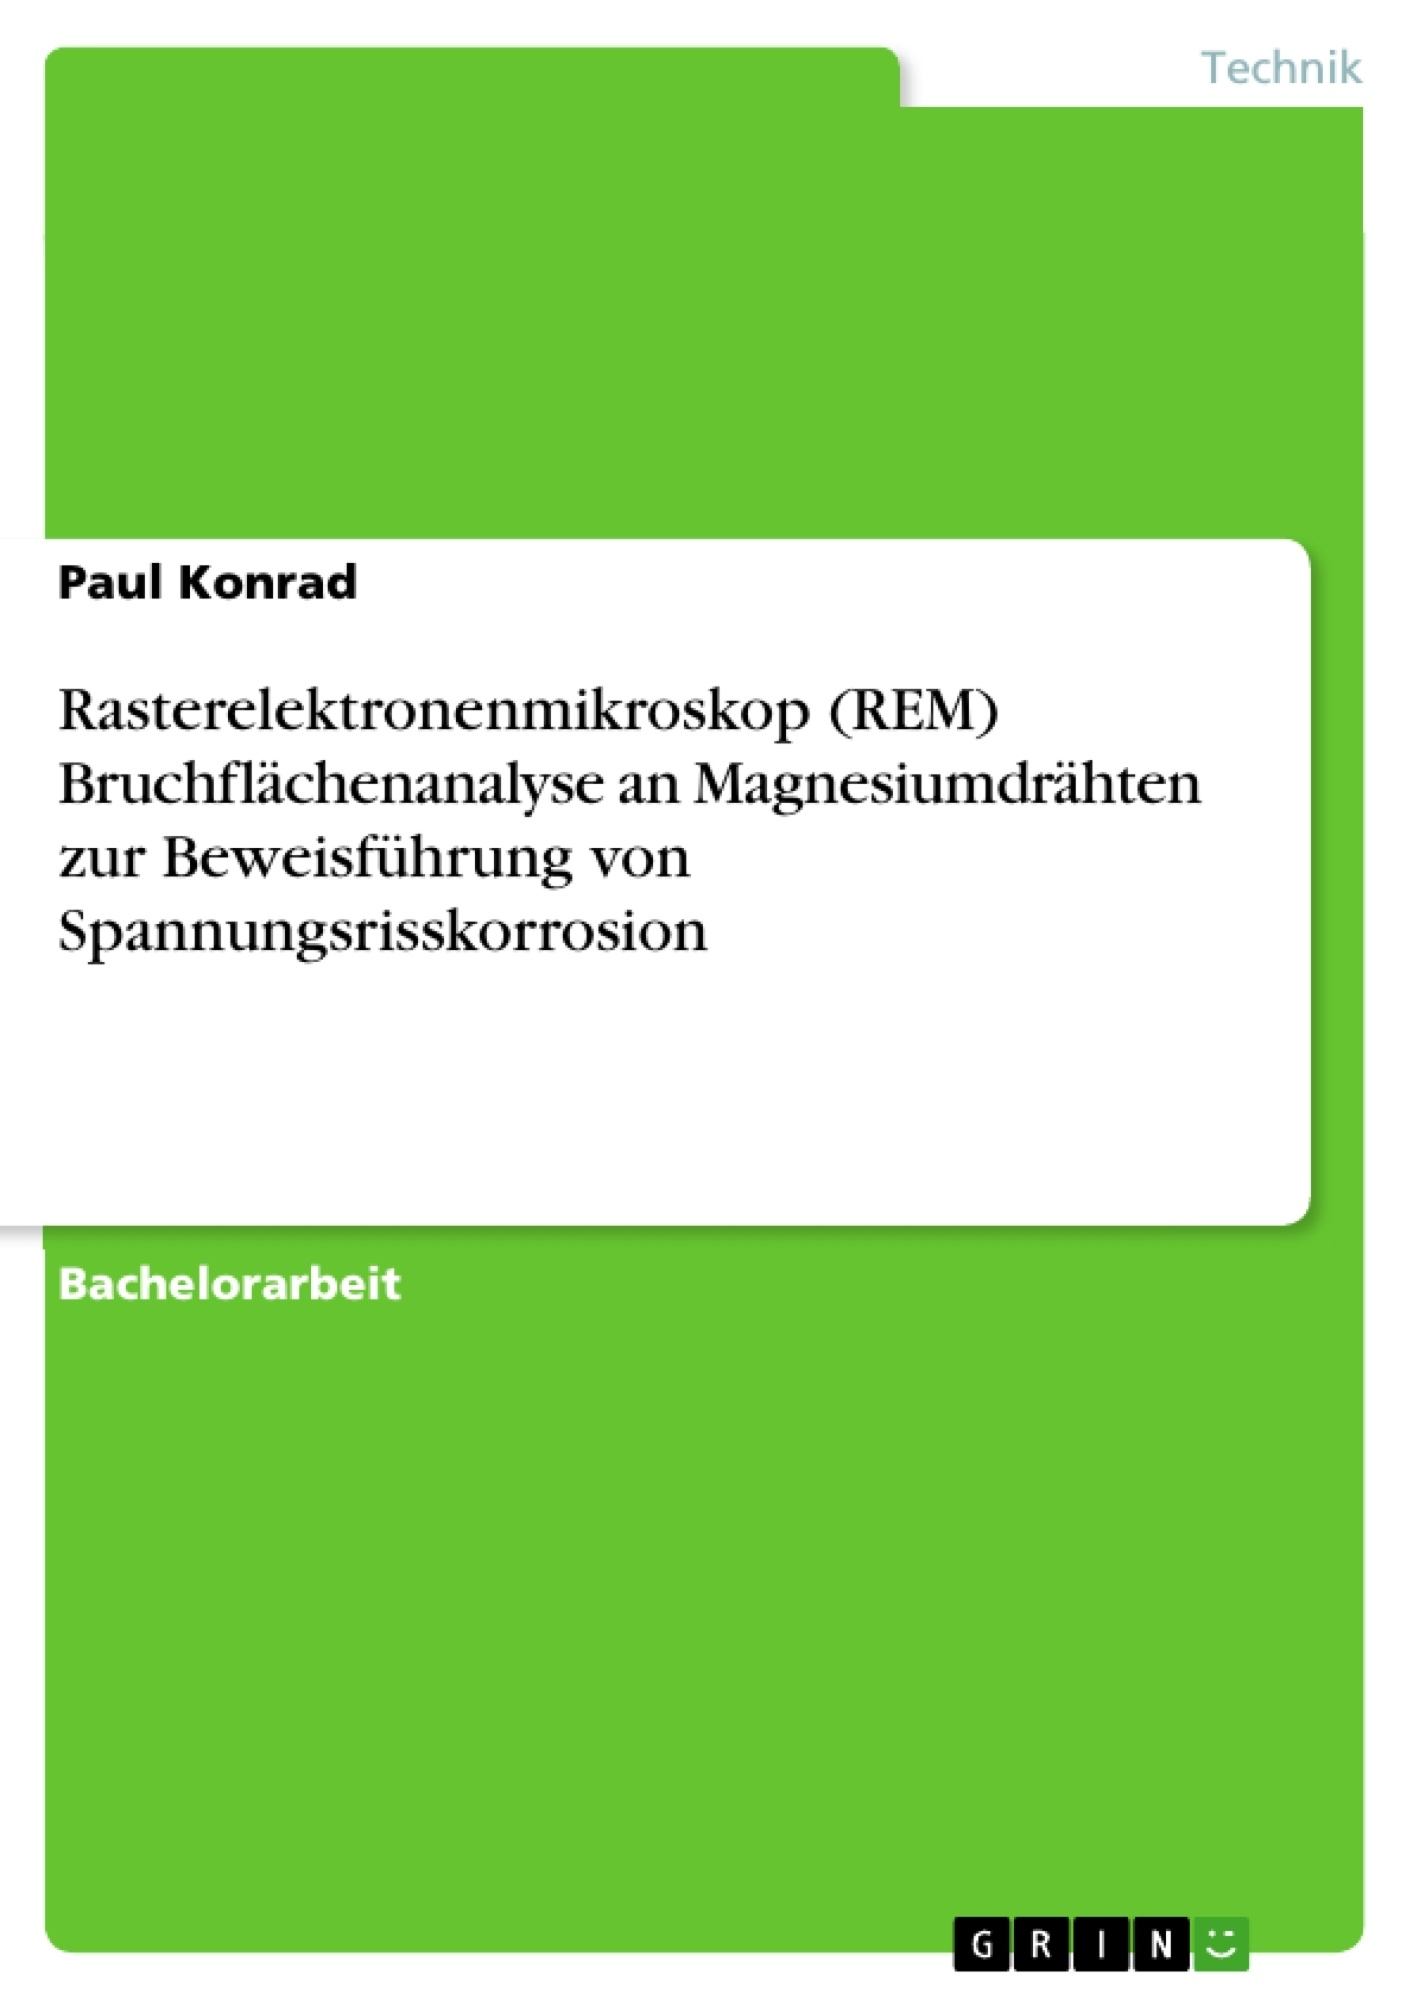 Rasterelektronenmikroskop (REM) Bruchflächenanalyse an ...